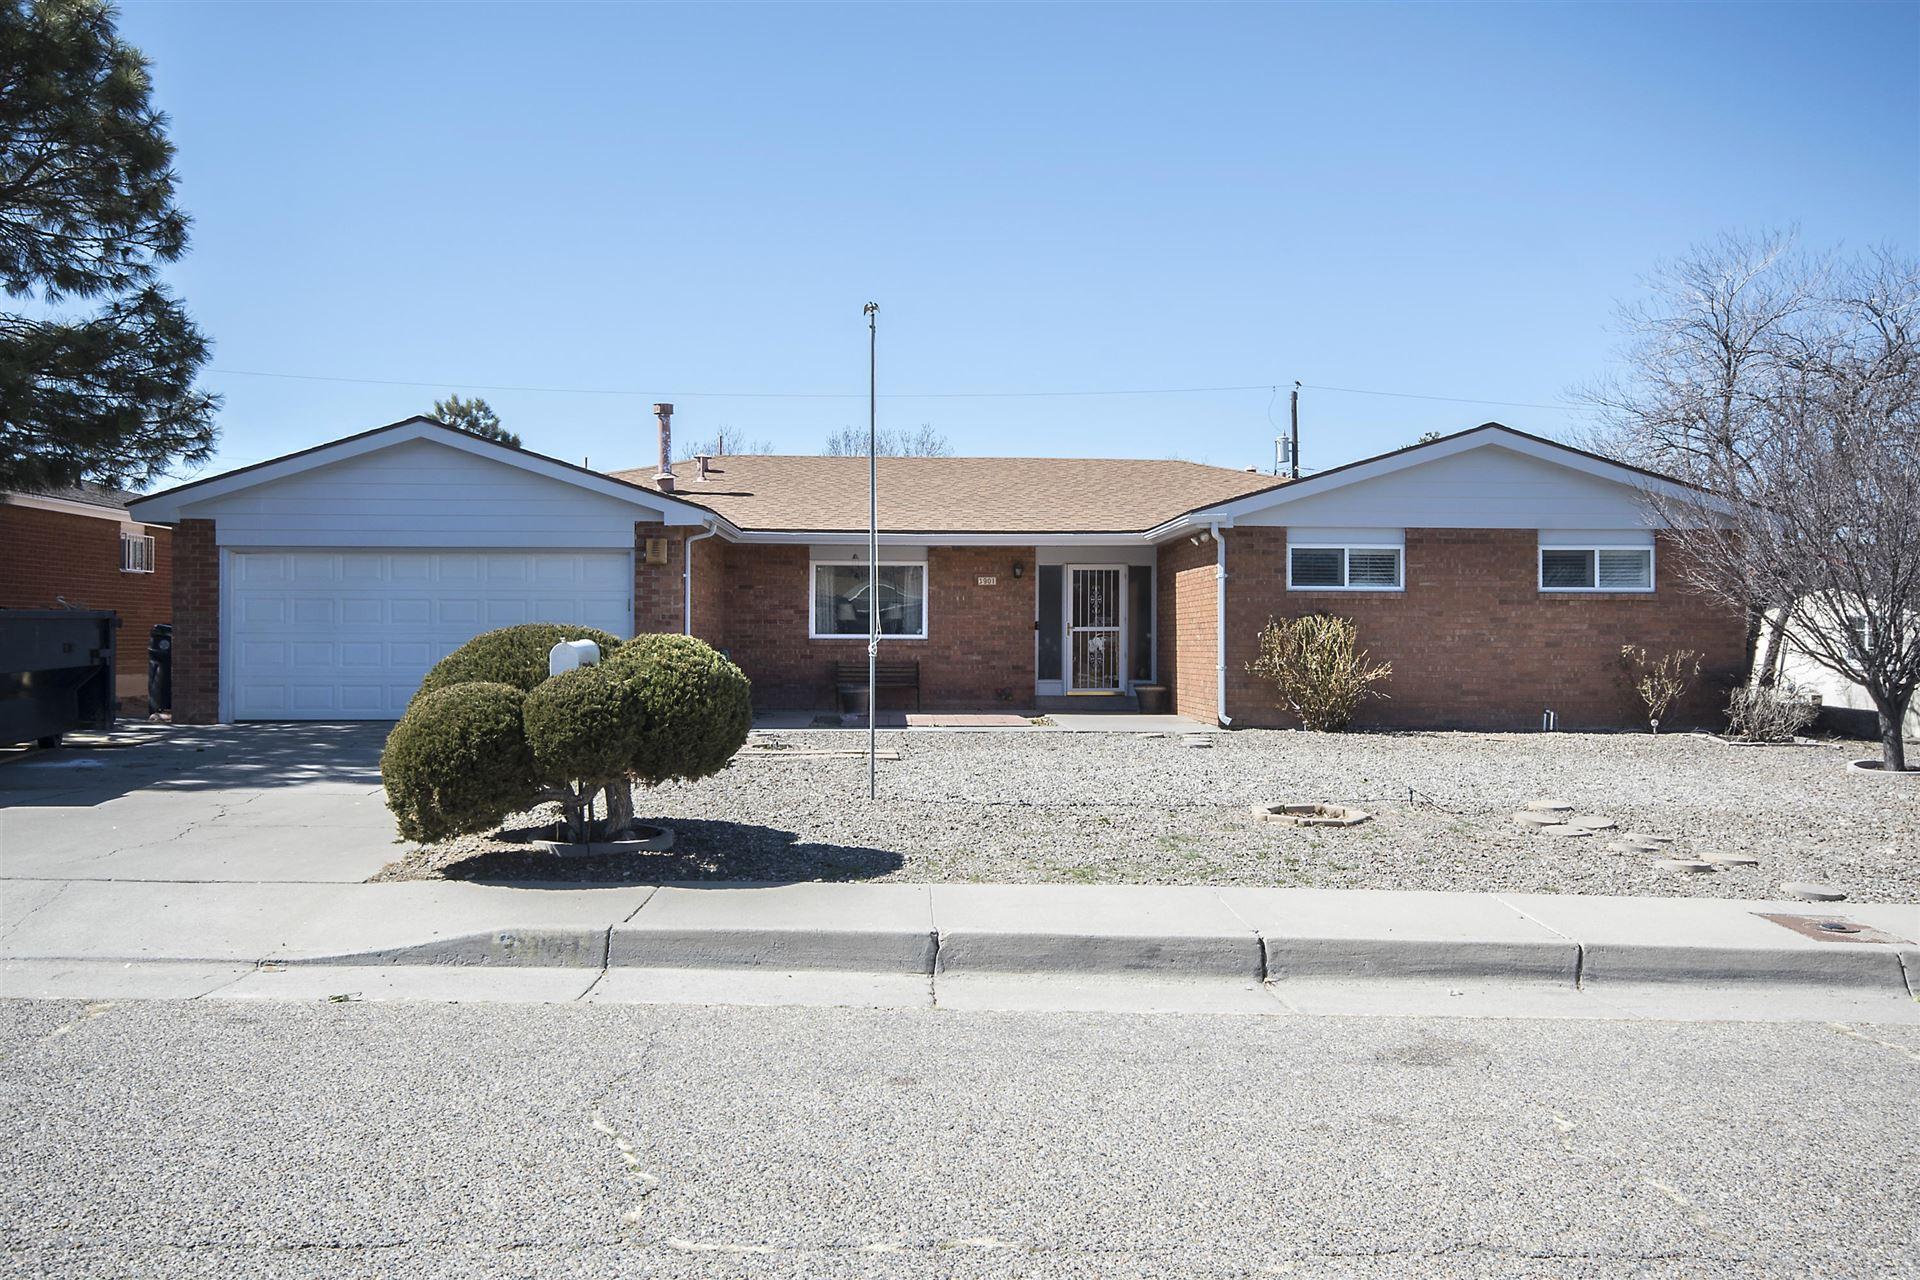 3901 WELLESLEY Drive NE, Albuquerque, NM 87107 - MLS#: 986852